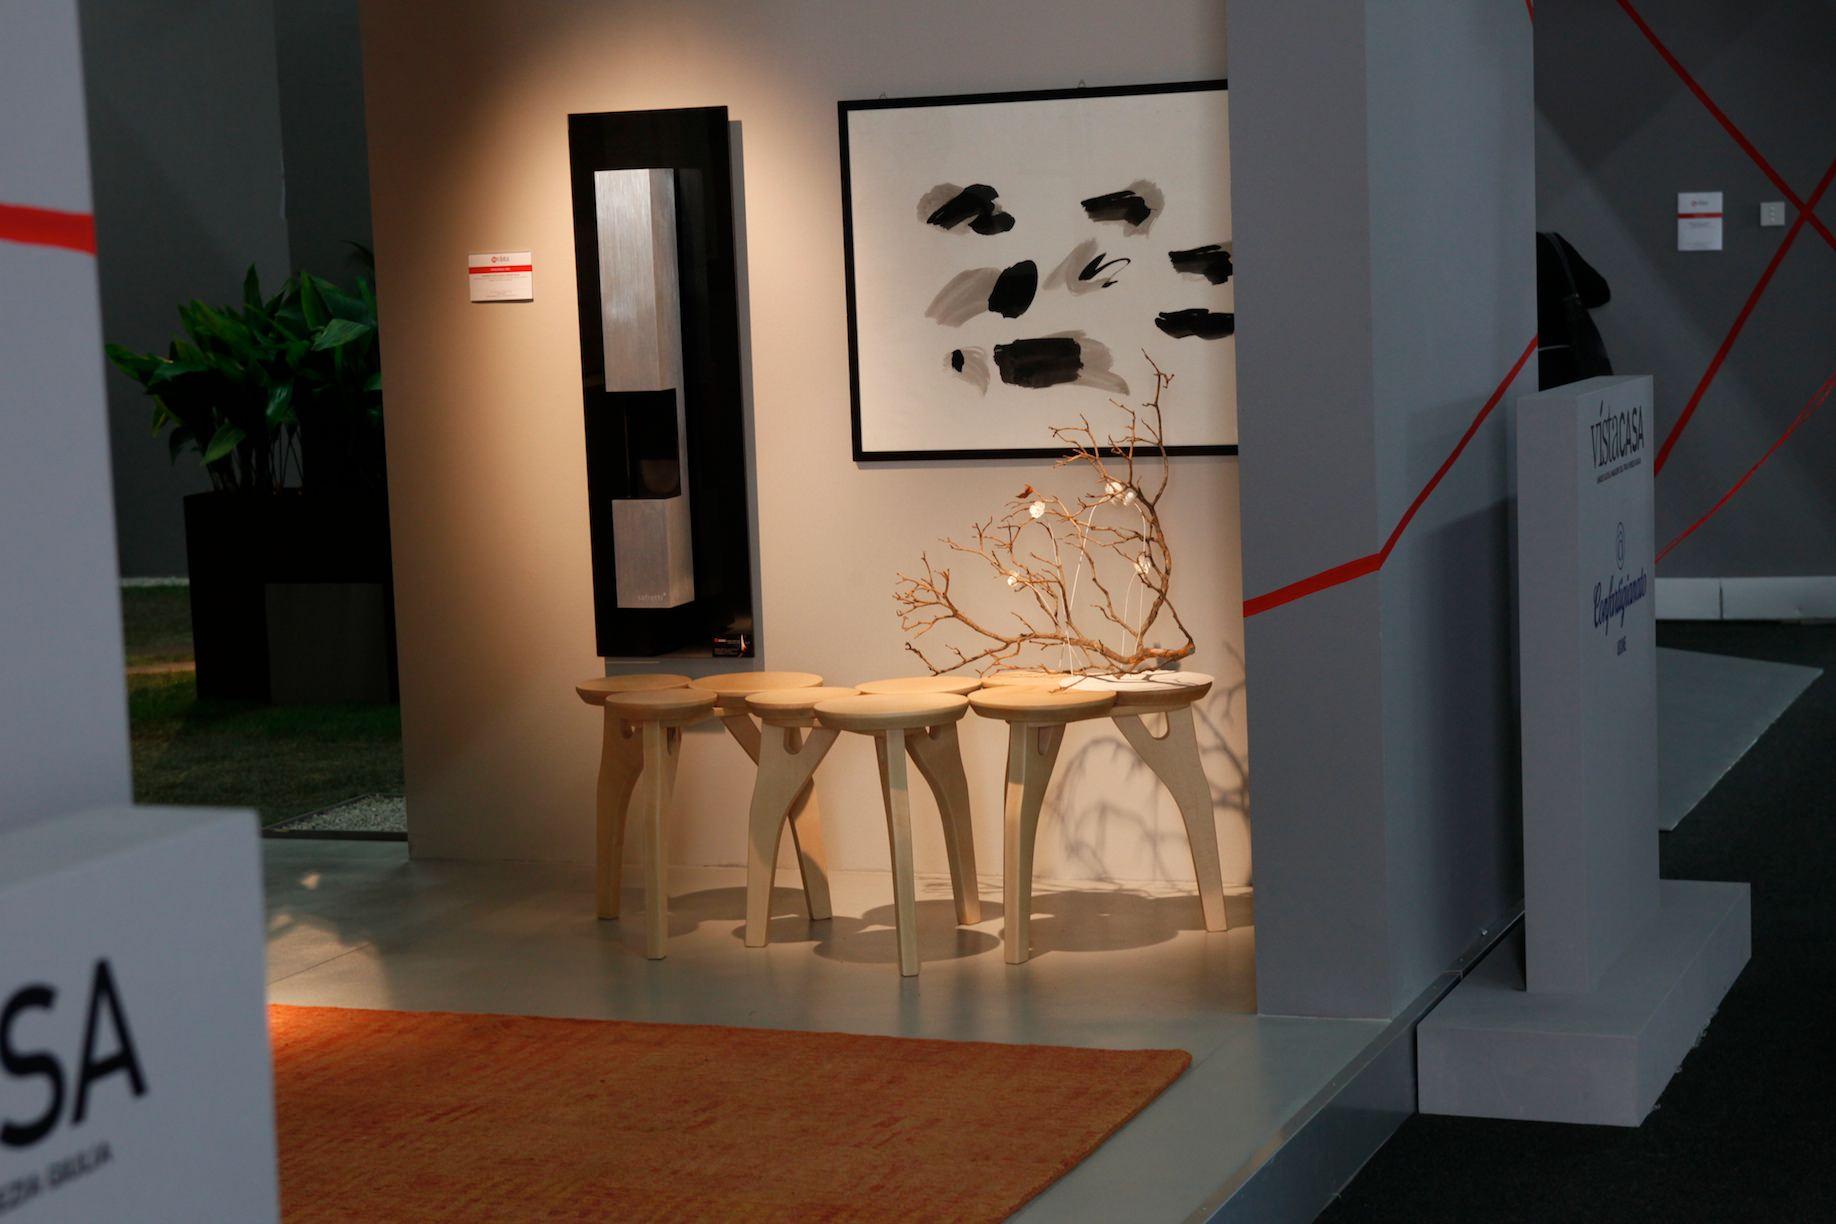 Partecipazione fiera casa moderna udine 2014 for Fiera udine casa moderna